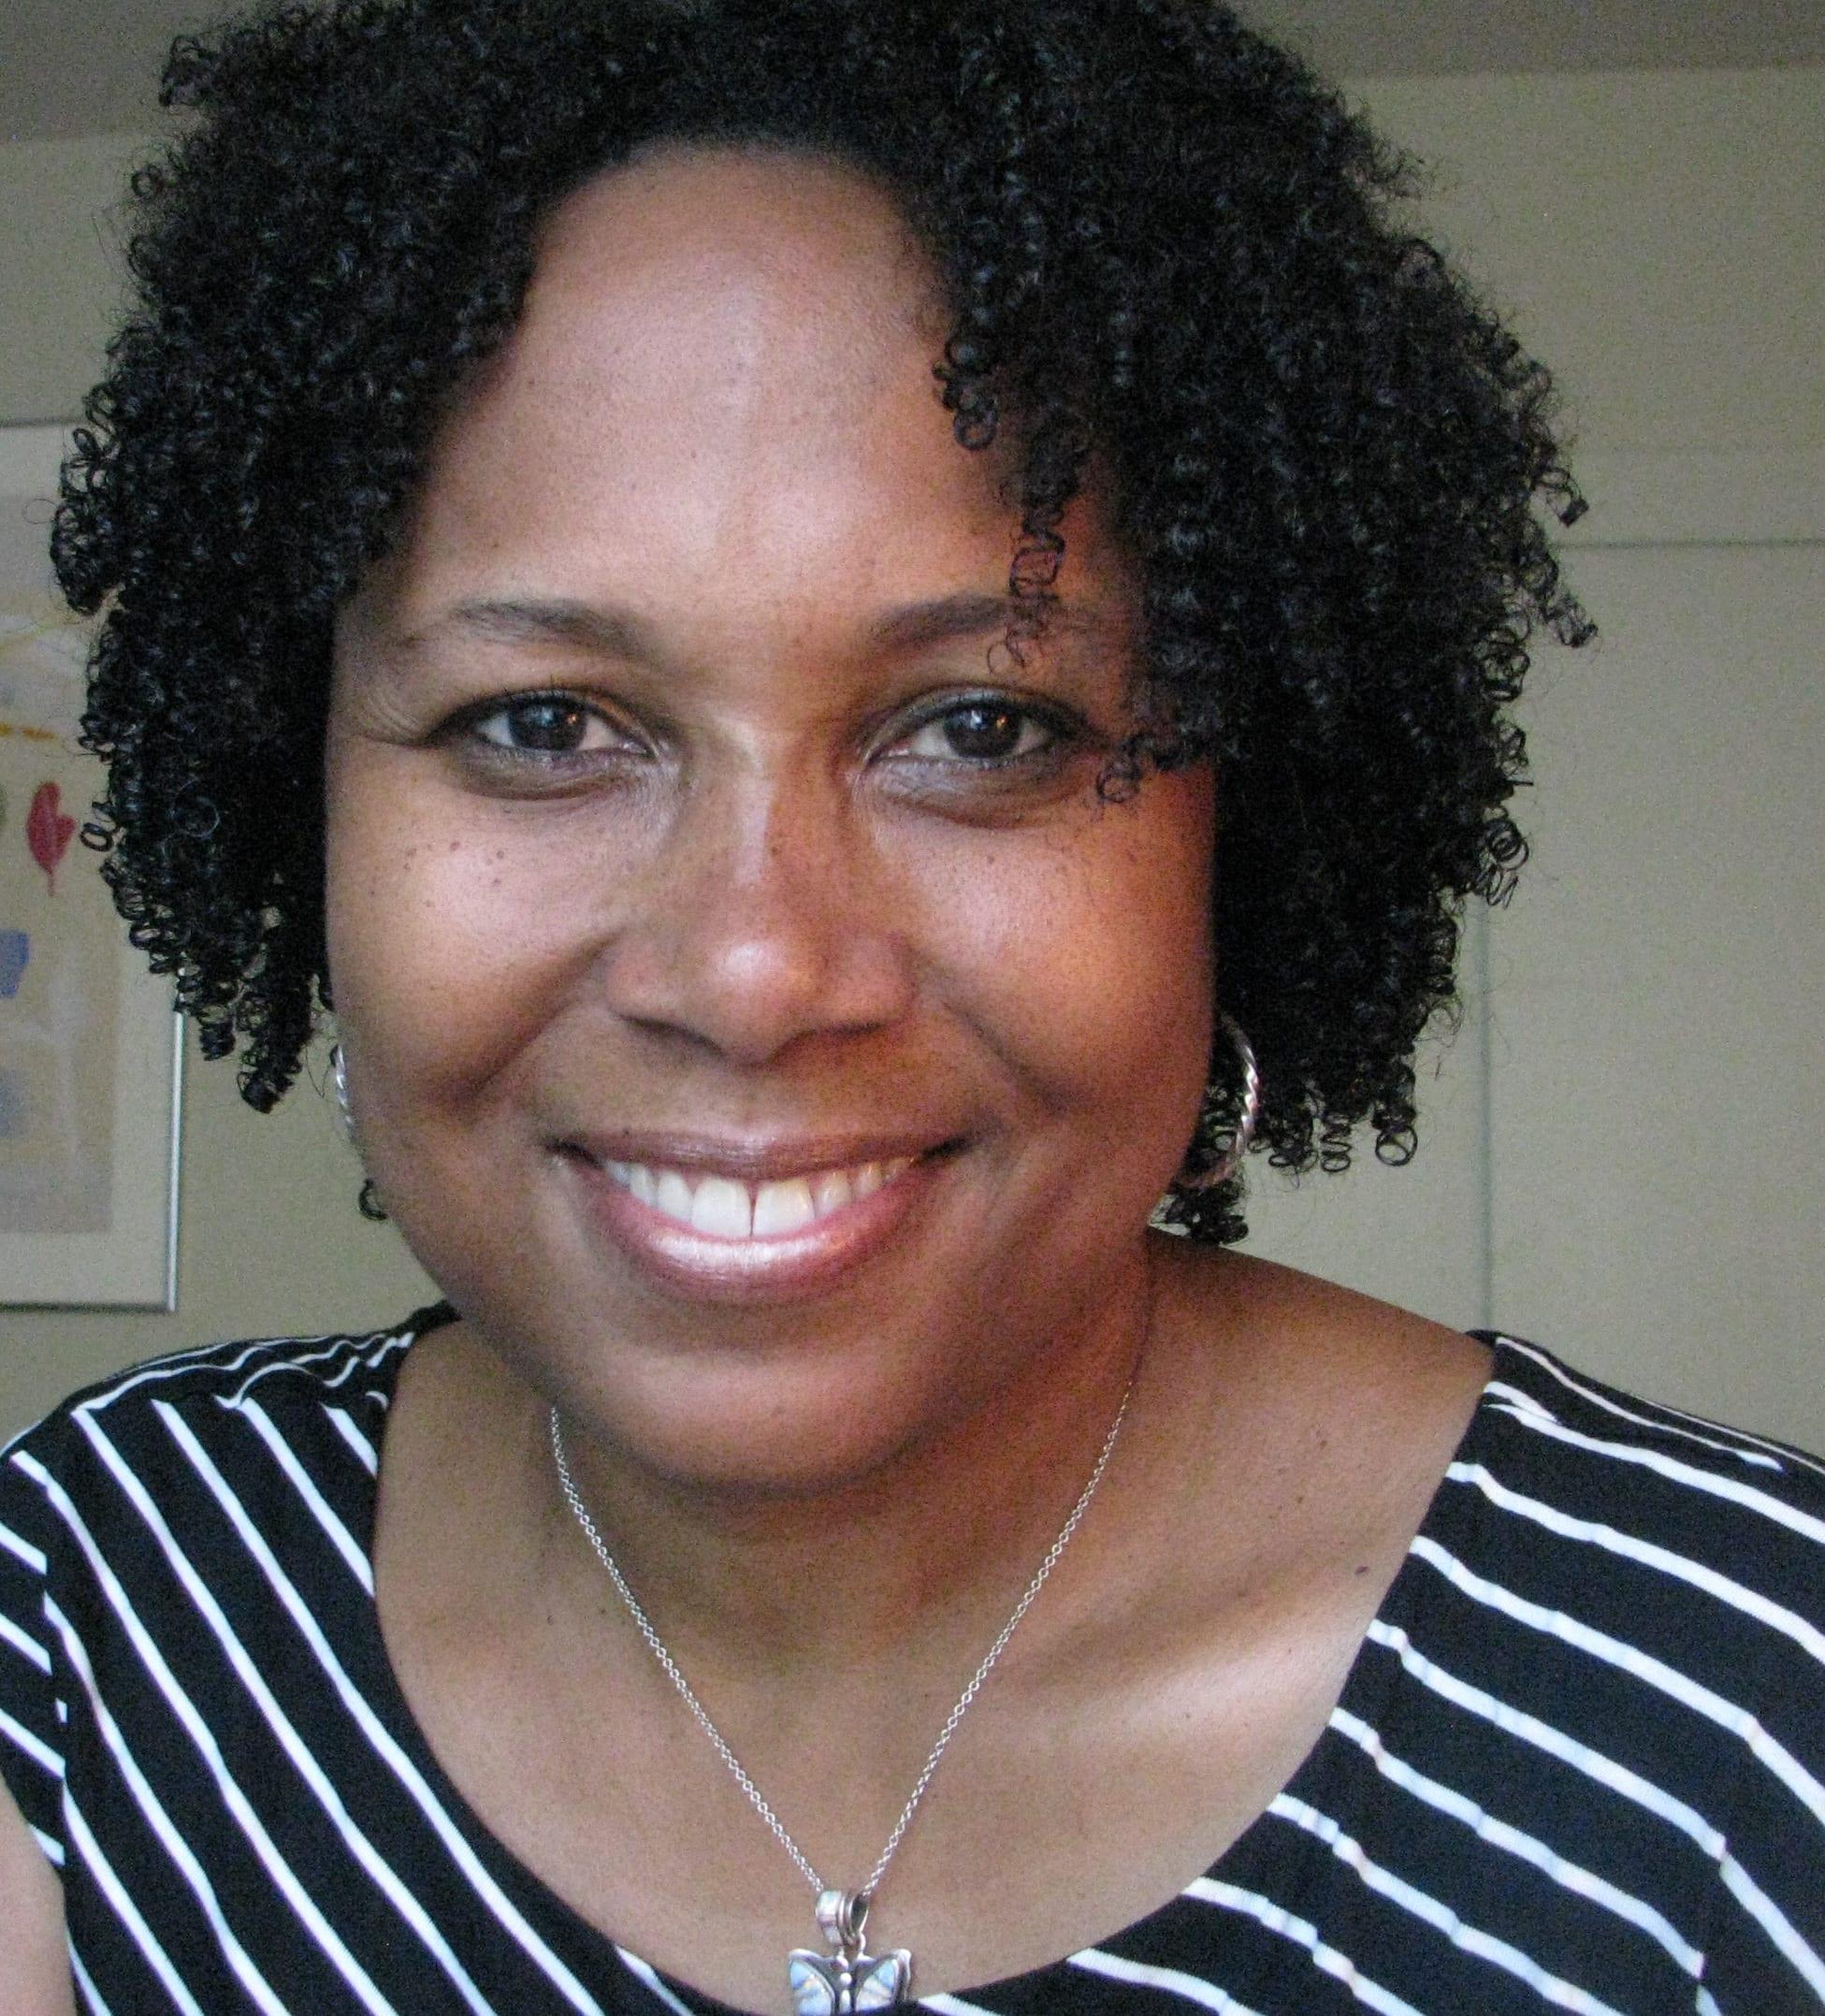 Kimberly Faulkner, ATR-BC, LCAT